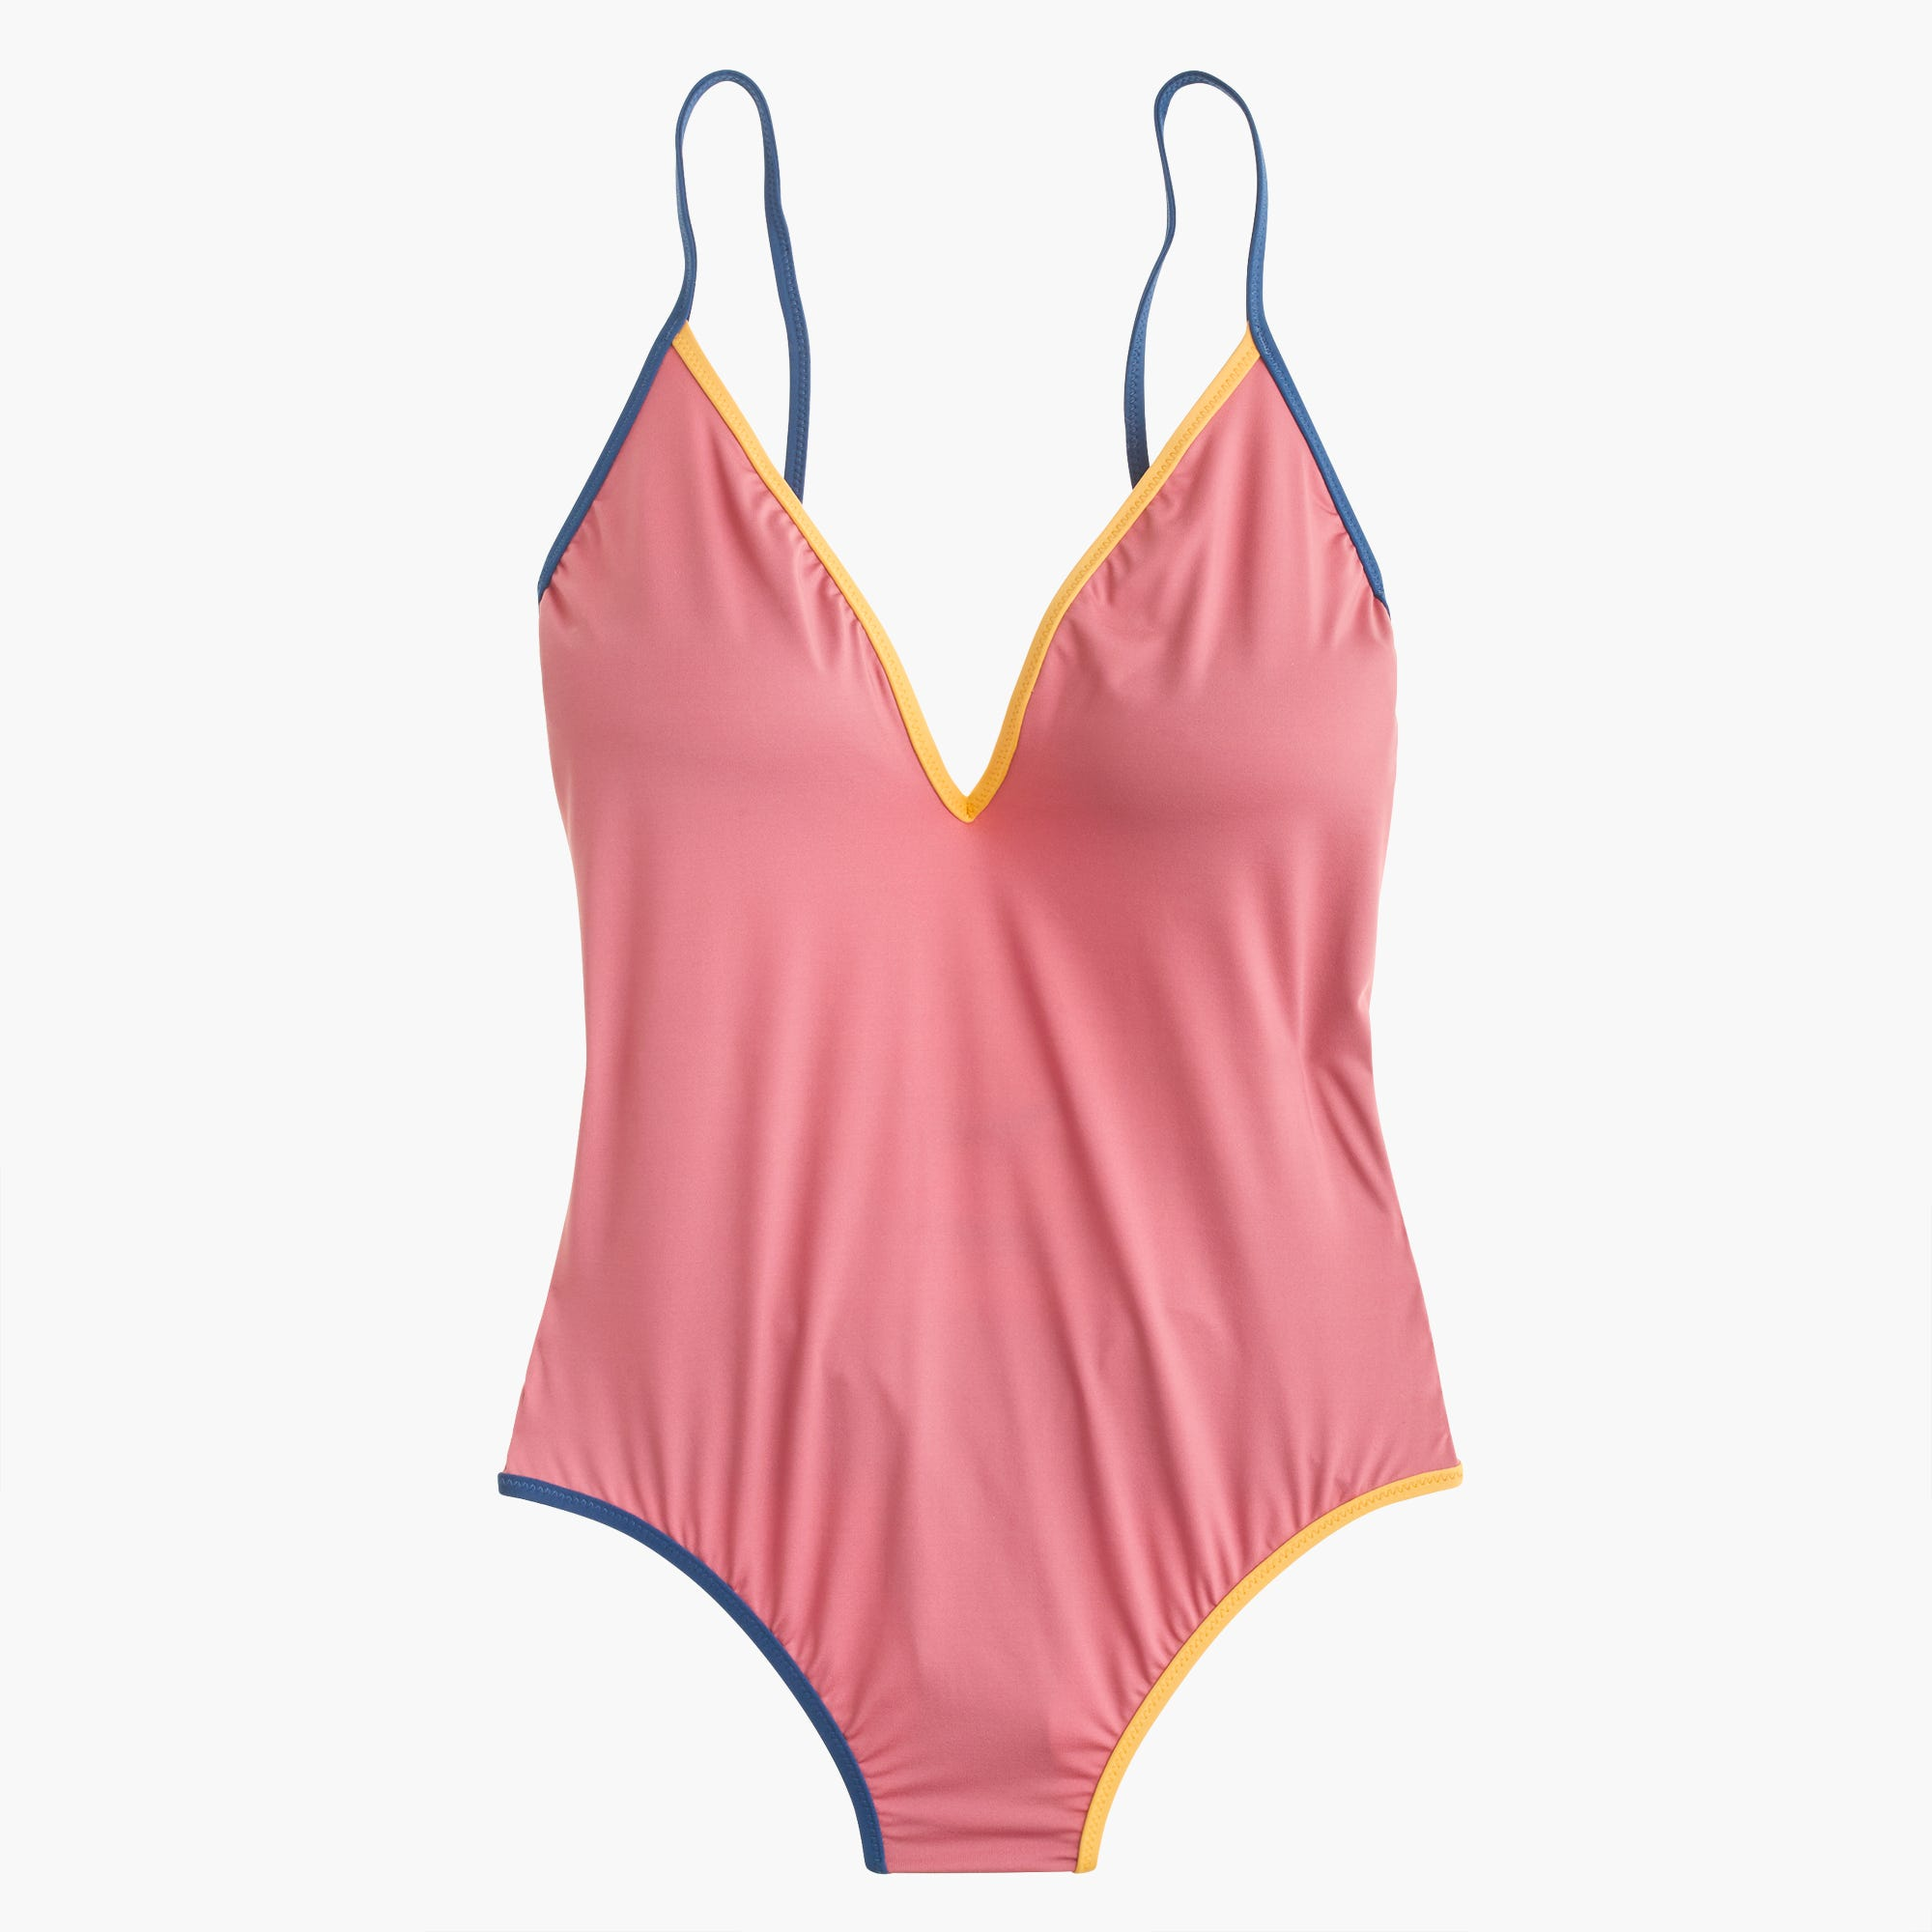 fce2a3aa8c4f J Crew Playa Swimwear Collection Summer 2018